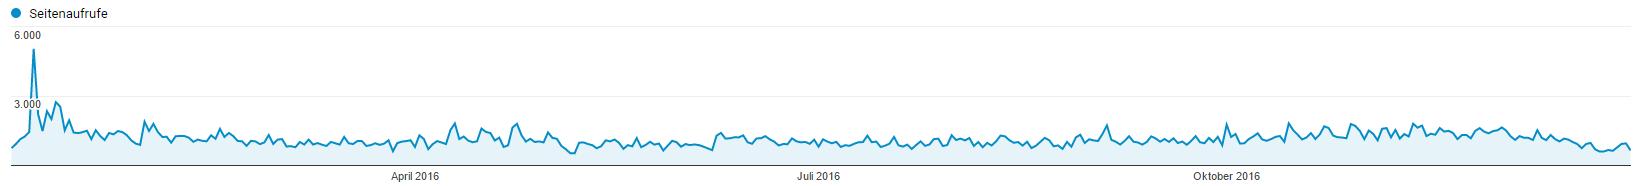 Salala.de Statistik 2016